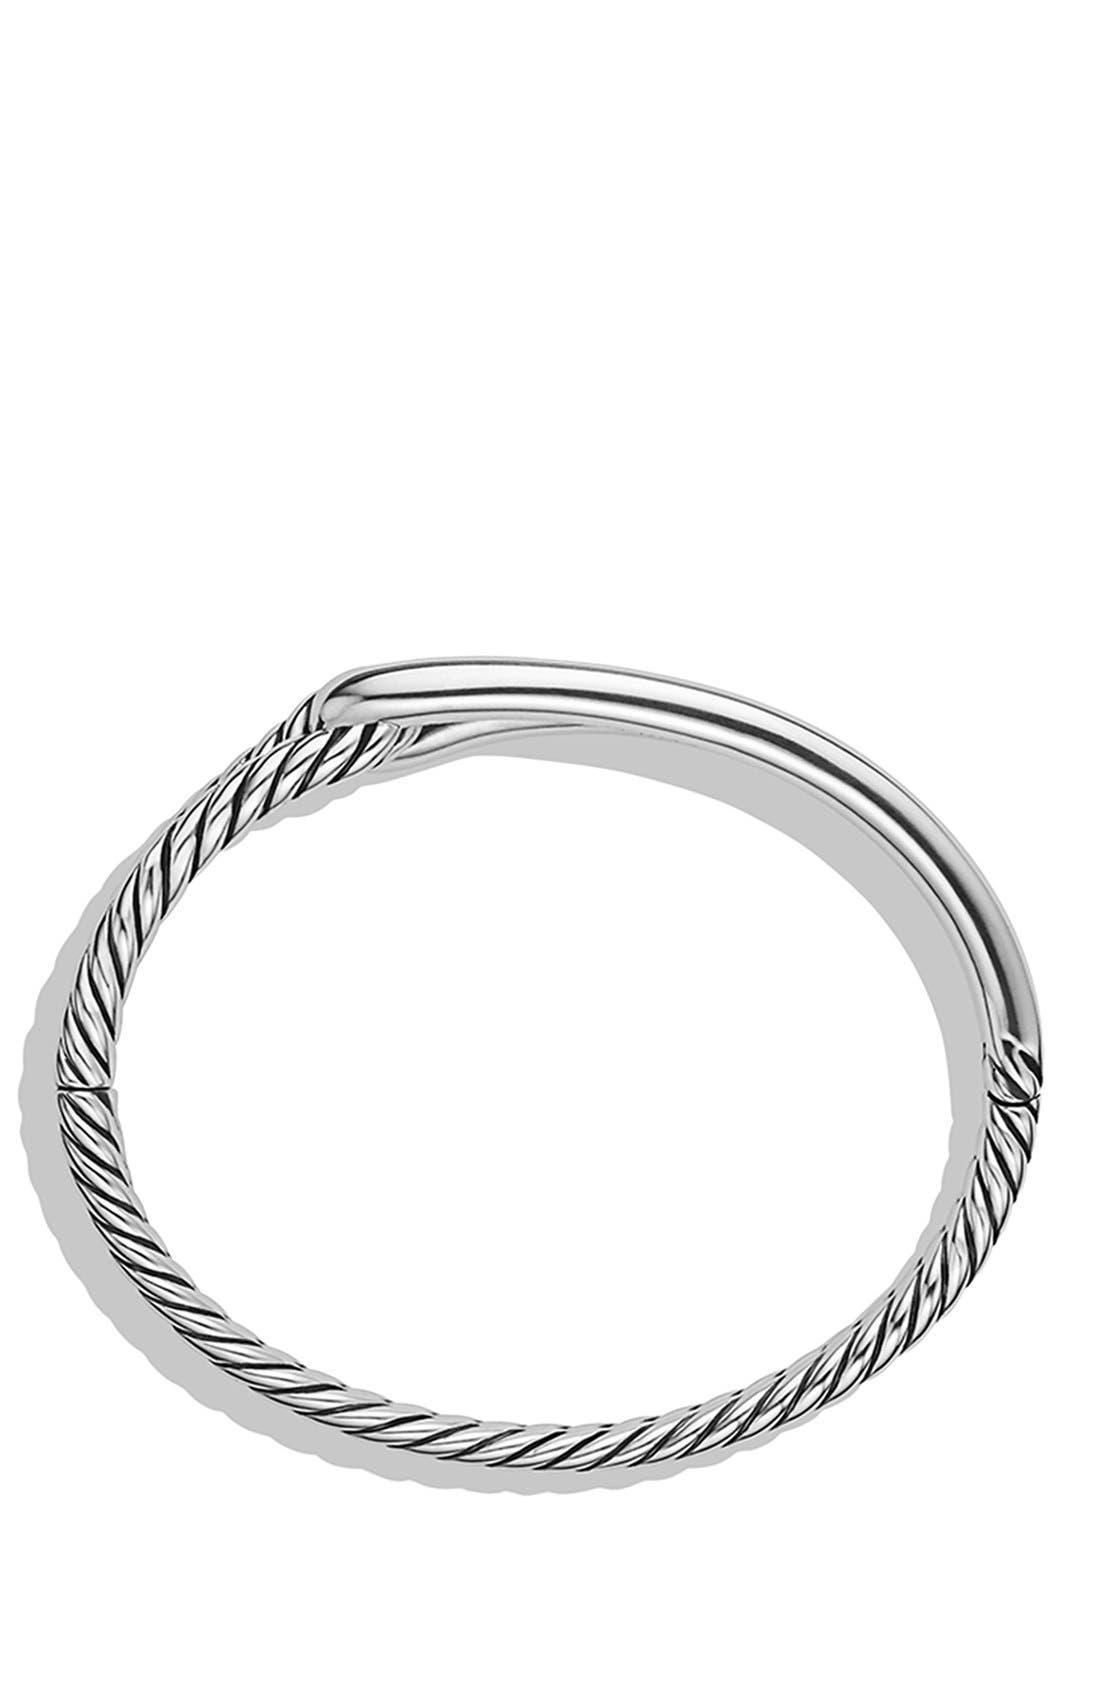 'Labyrinth' Single Loop Bracelet,                             Alternate thumbnail 2, color,                             SILVER